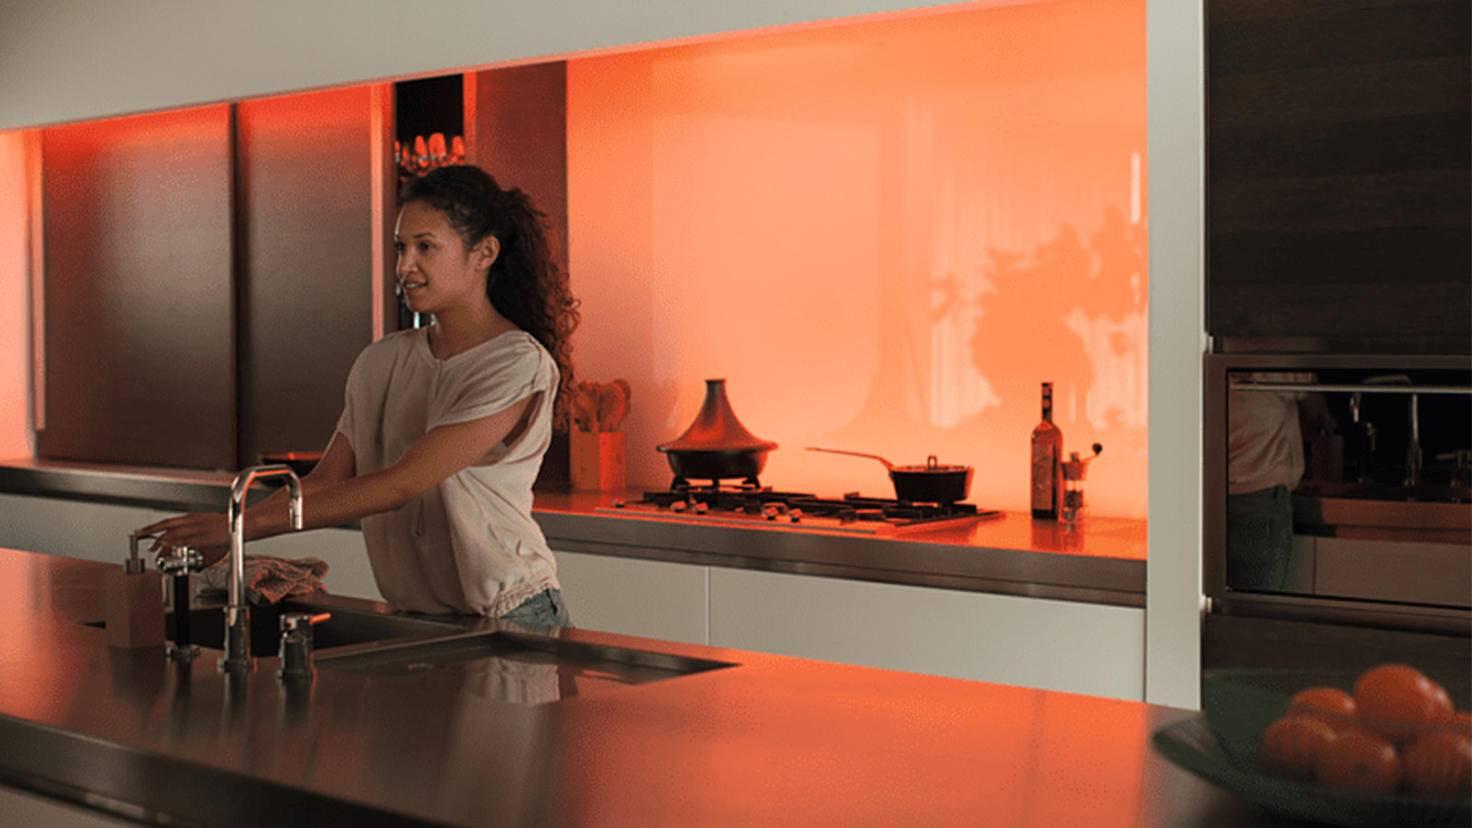 Philips Hue LightStrip Plus en orange dans la cuisine